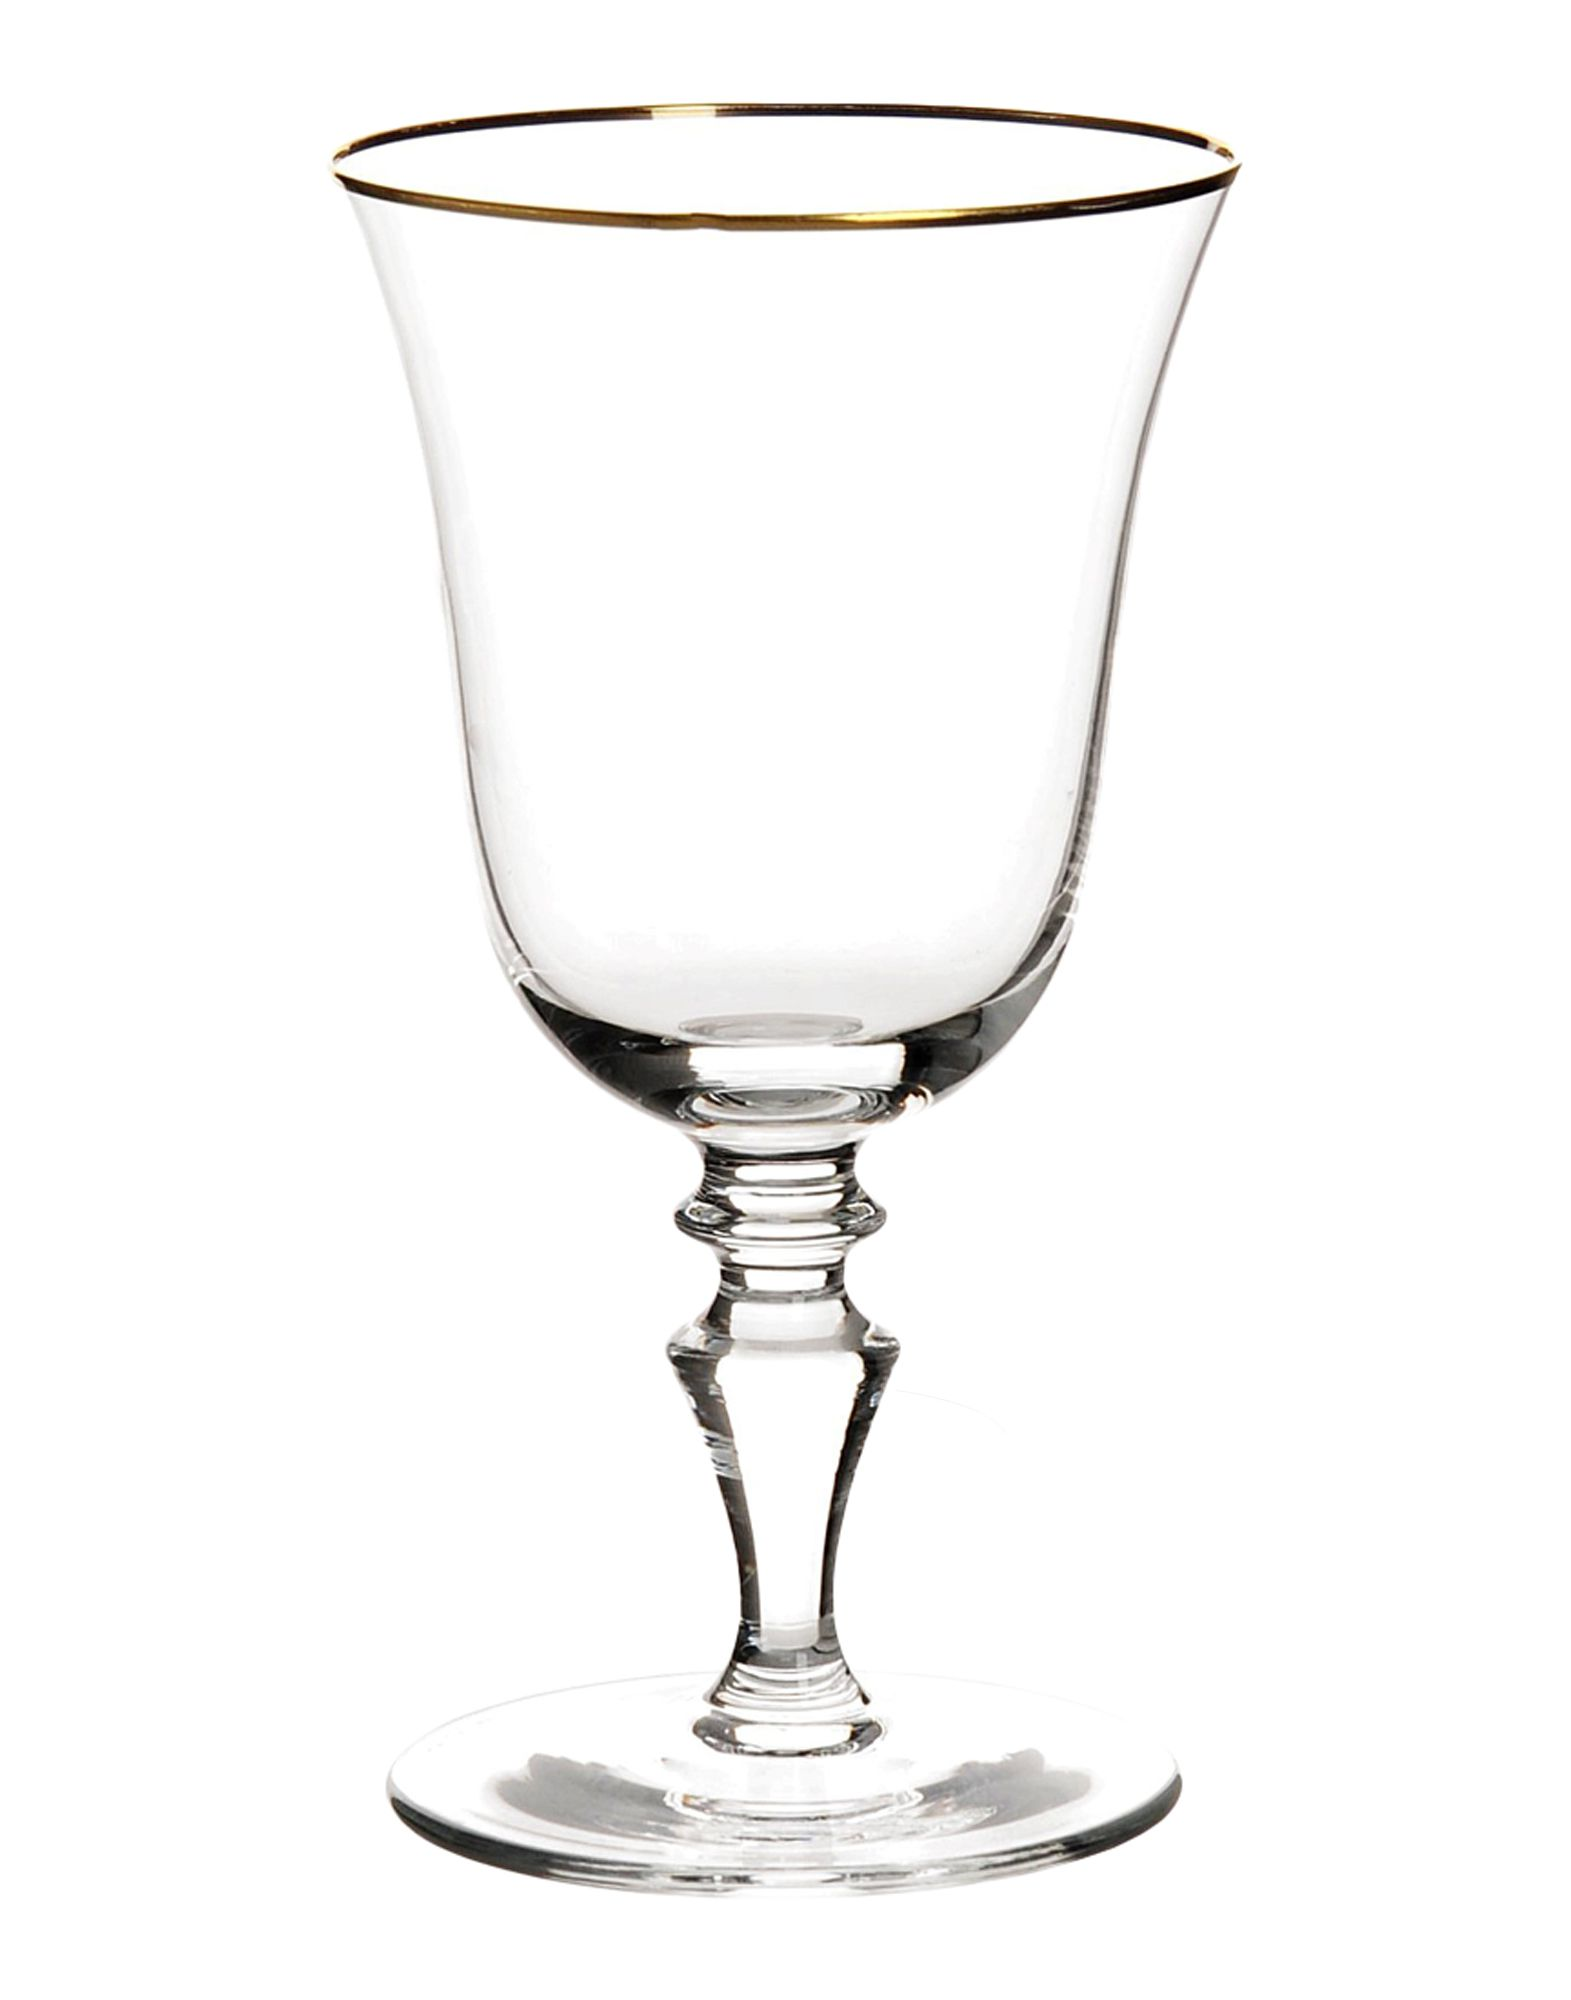 NASONMORETTI Стакан cтеклянный стакан other brands d130722